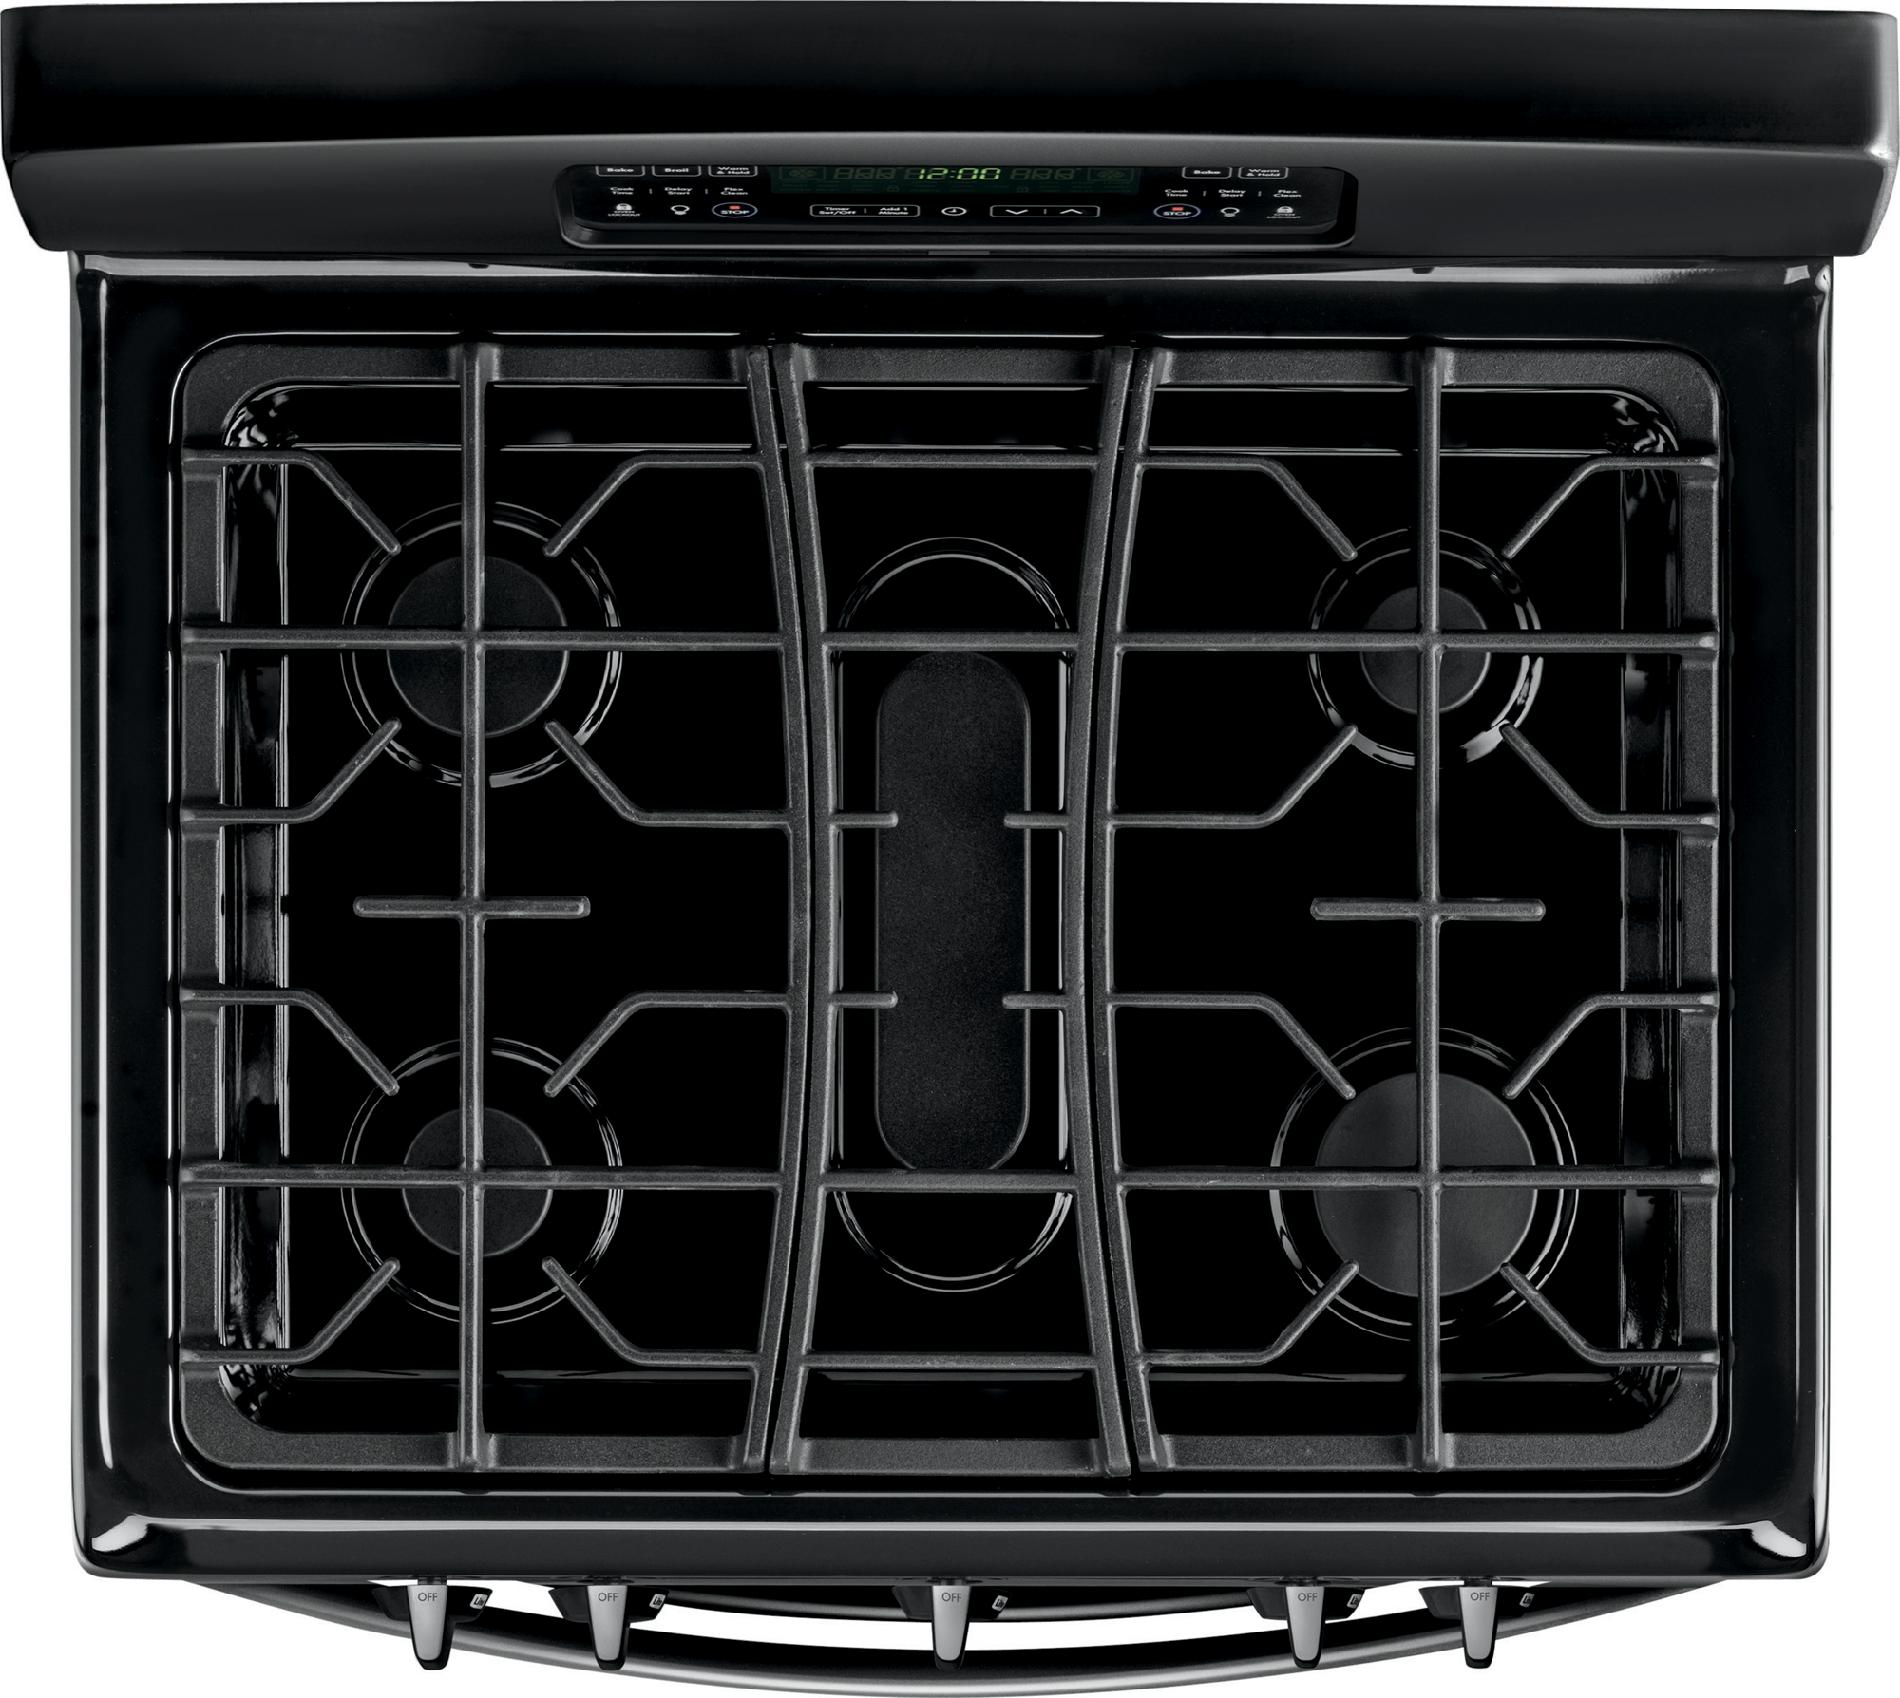 Kenmore 5.8 cu. ft. Double-Oven Gas Range - Black